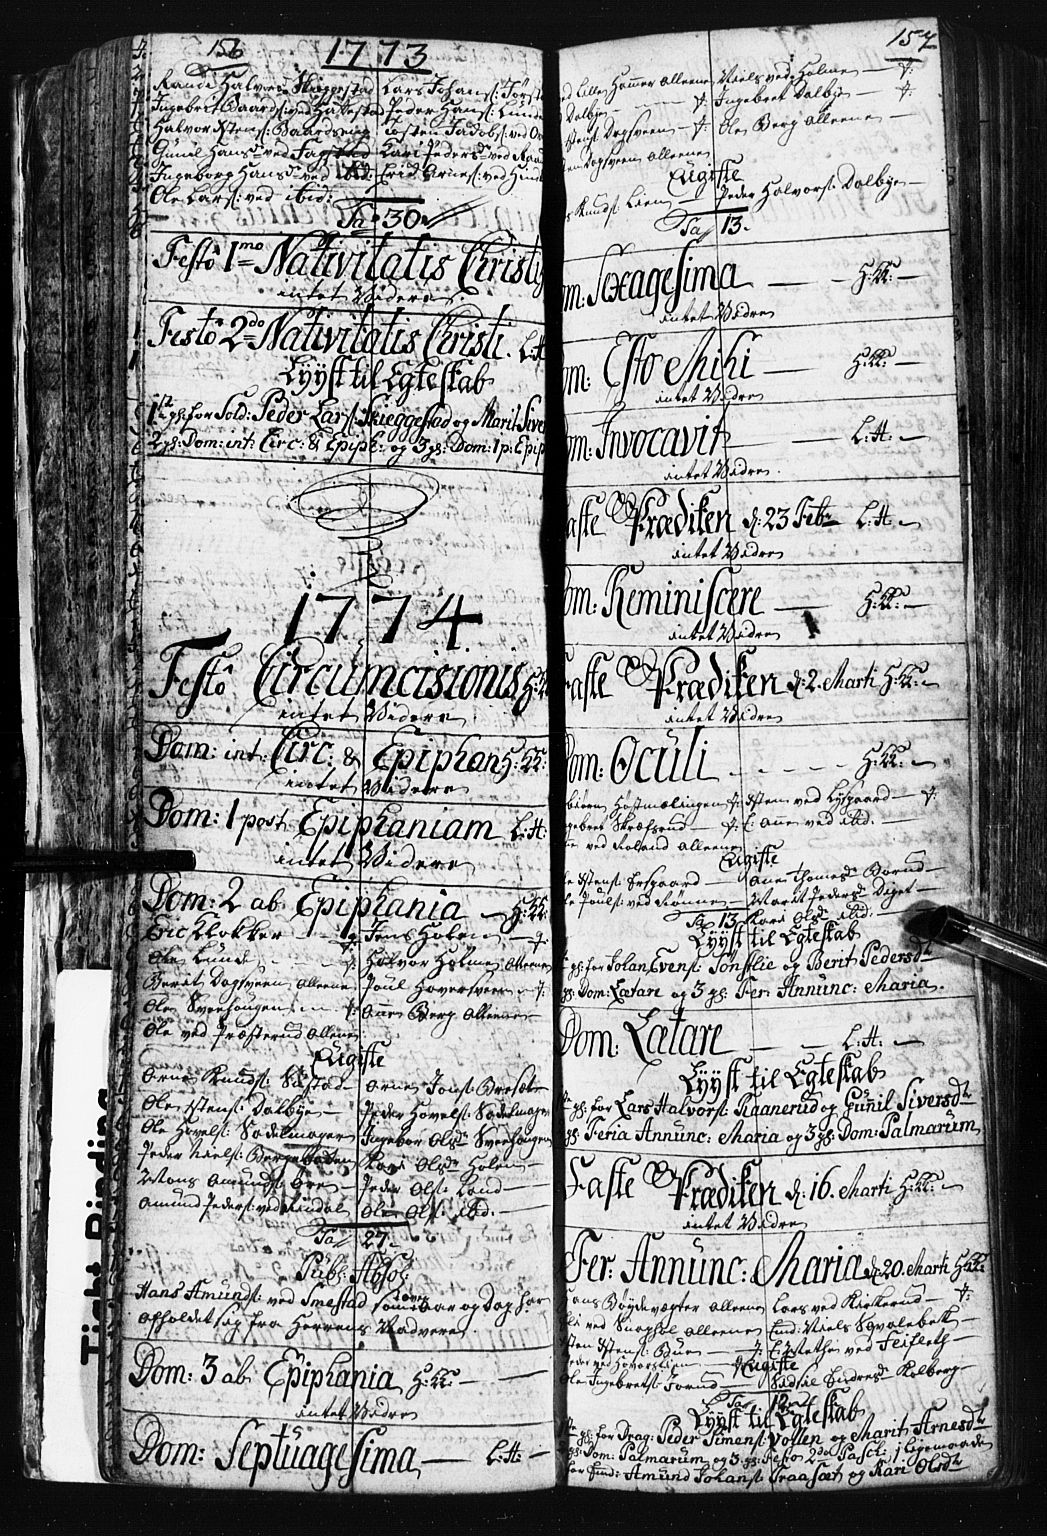 SAH, Fåberg prestekontor, Klokkerbok nr. 3, 1768-1796, s. 156-157